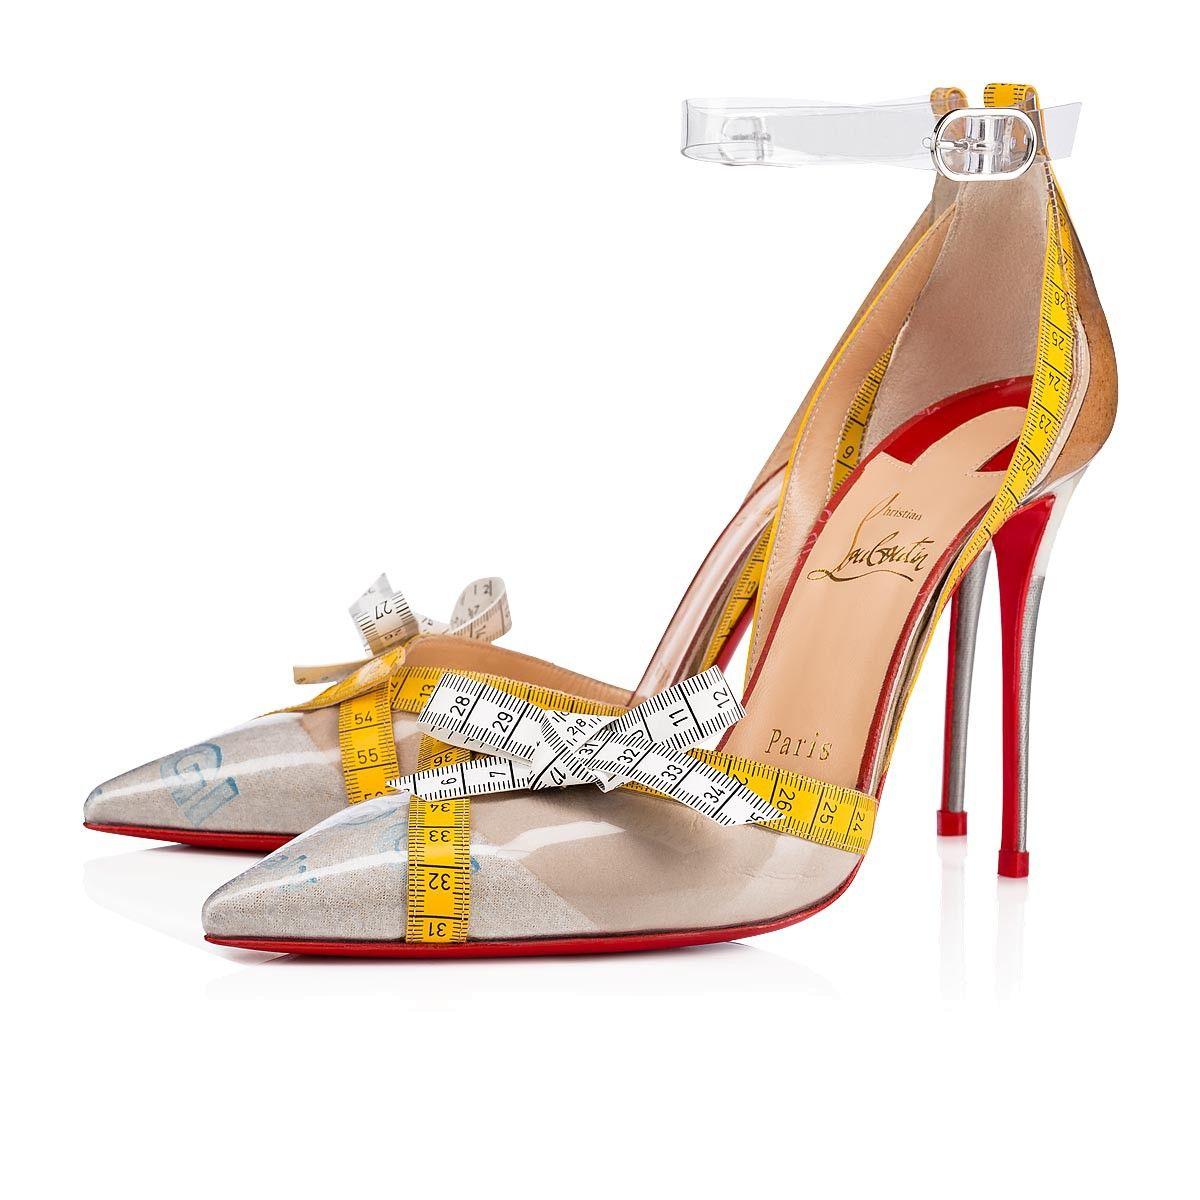 Metripump 100 Vers Transp Yellow Patent PVC - Women Shoes - Christian  Louboutin 5181f79dee